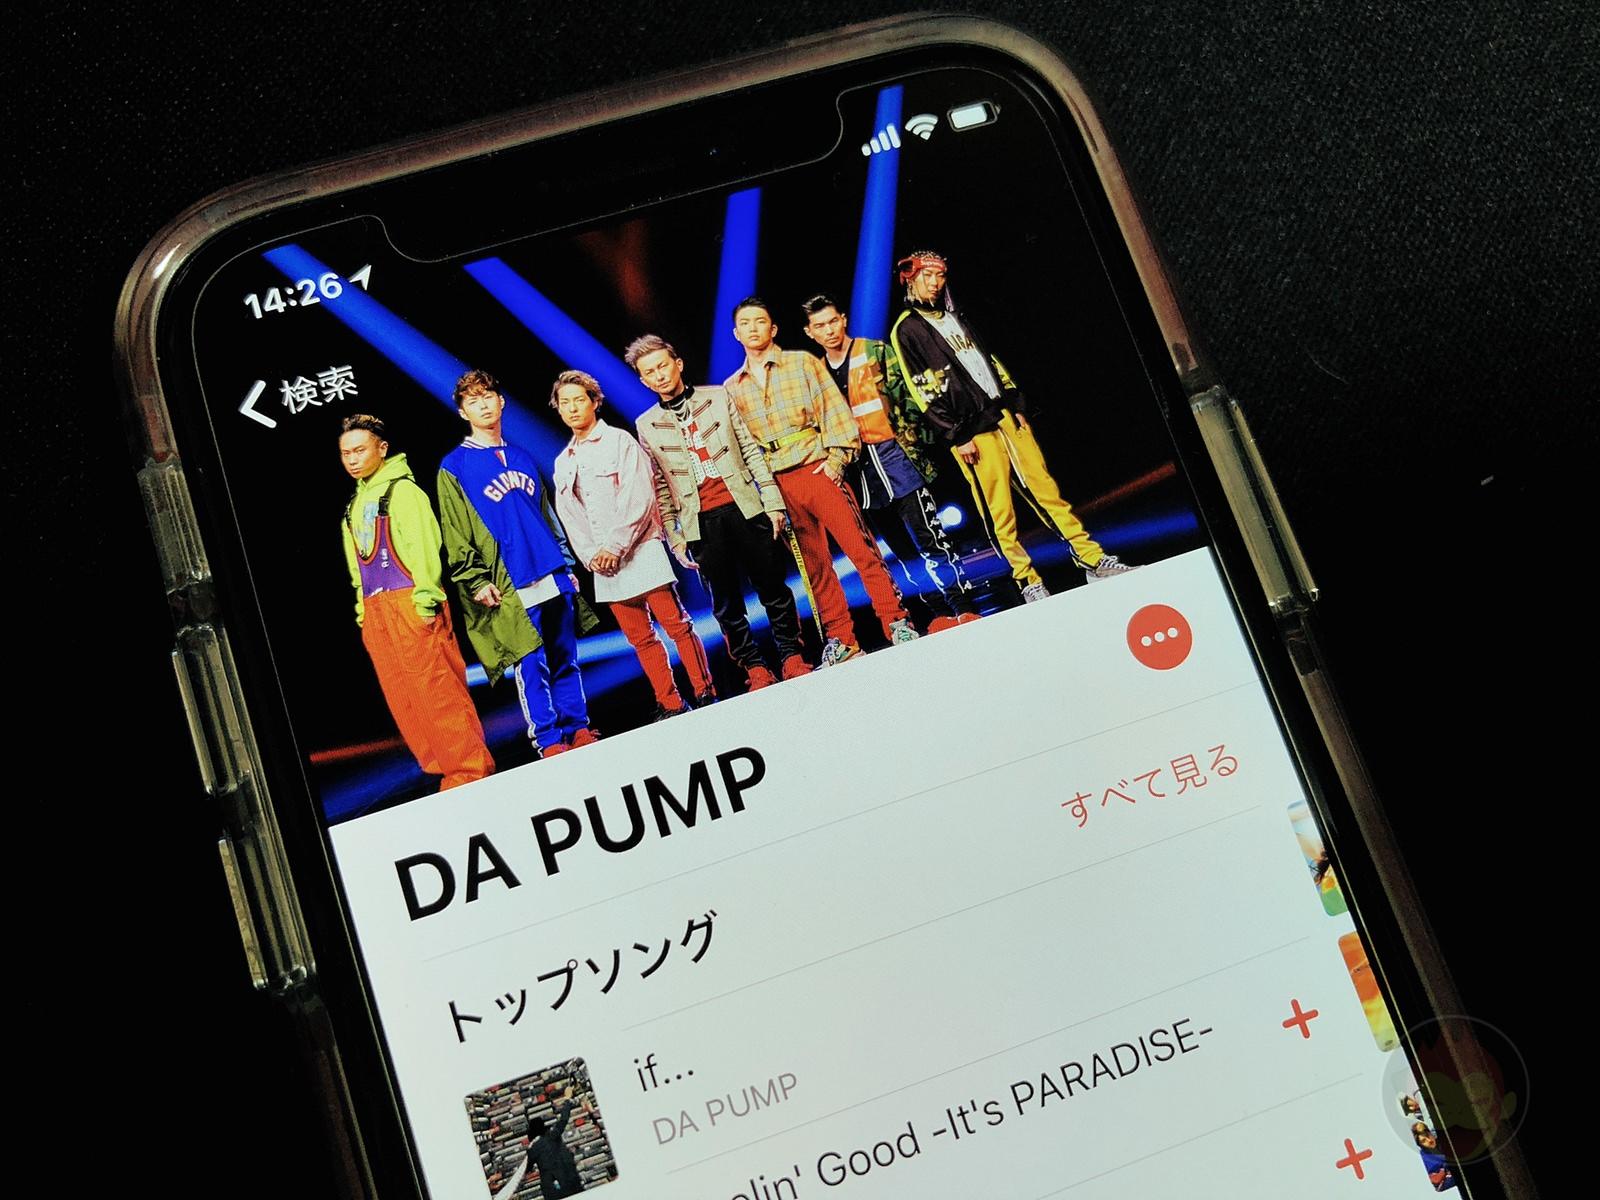 Da pump apple music